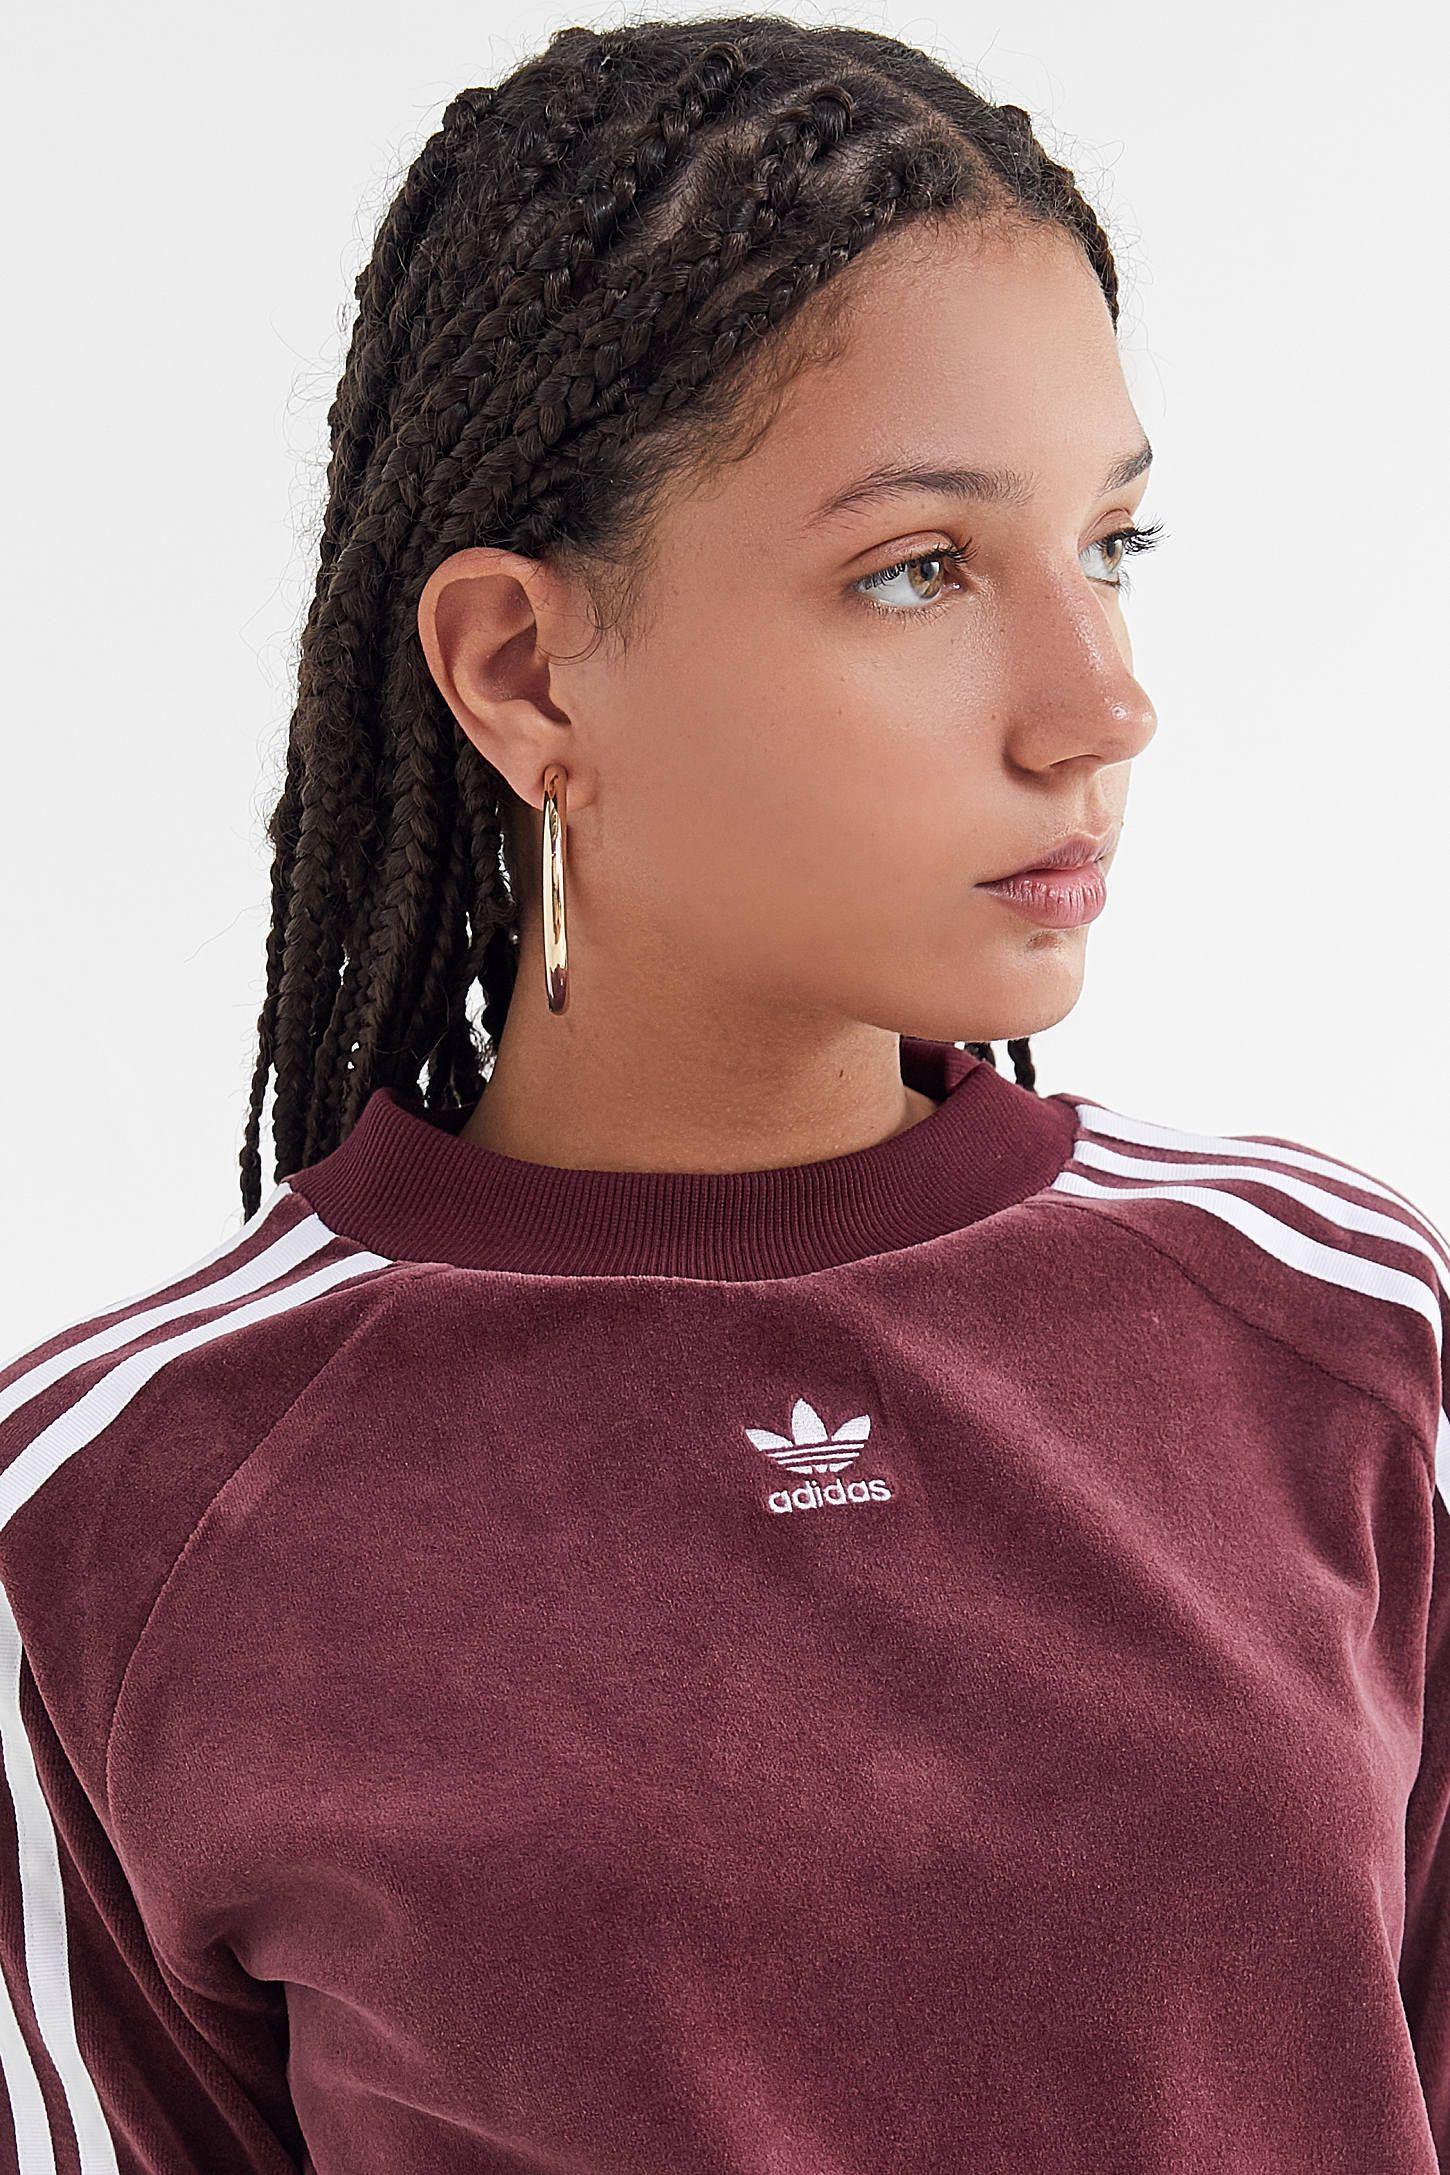 adidas Velvet Crew Neck Sweatshirt | Crew neck sweatshirt